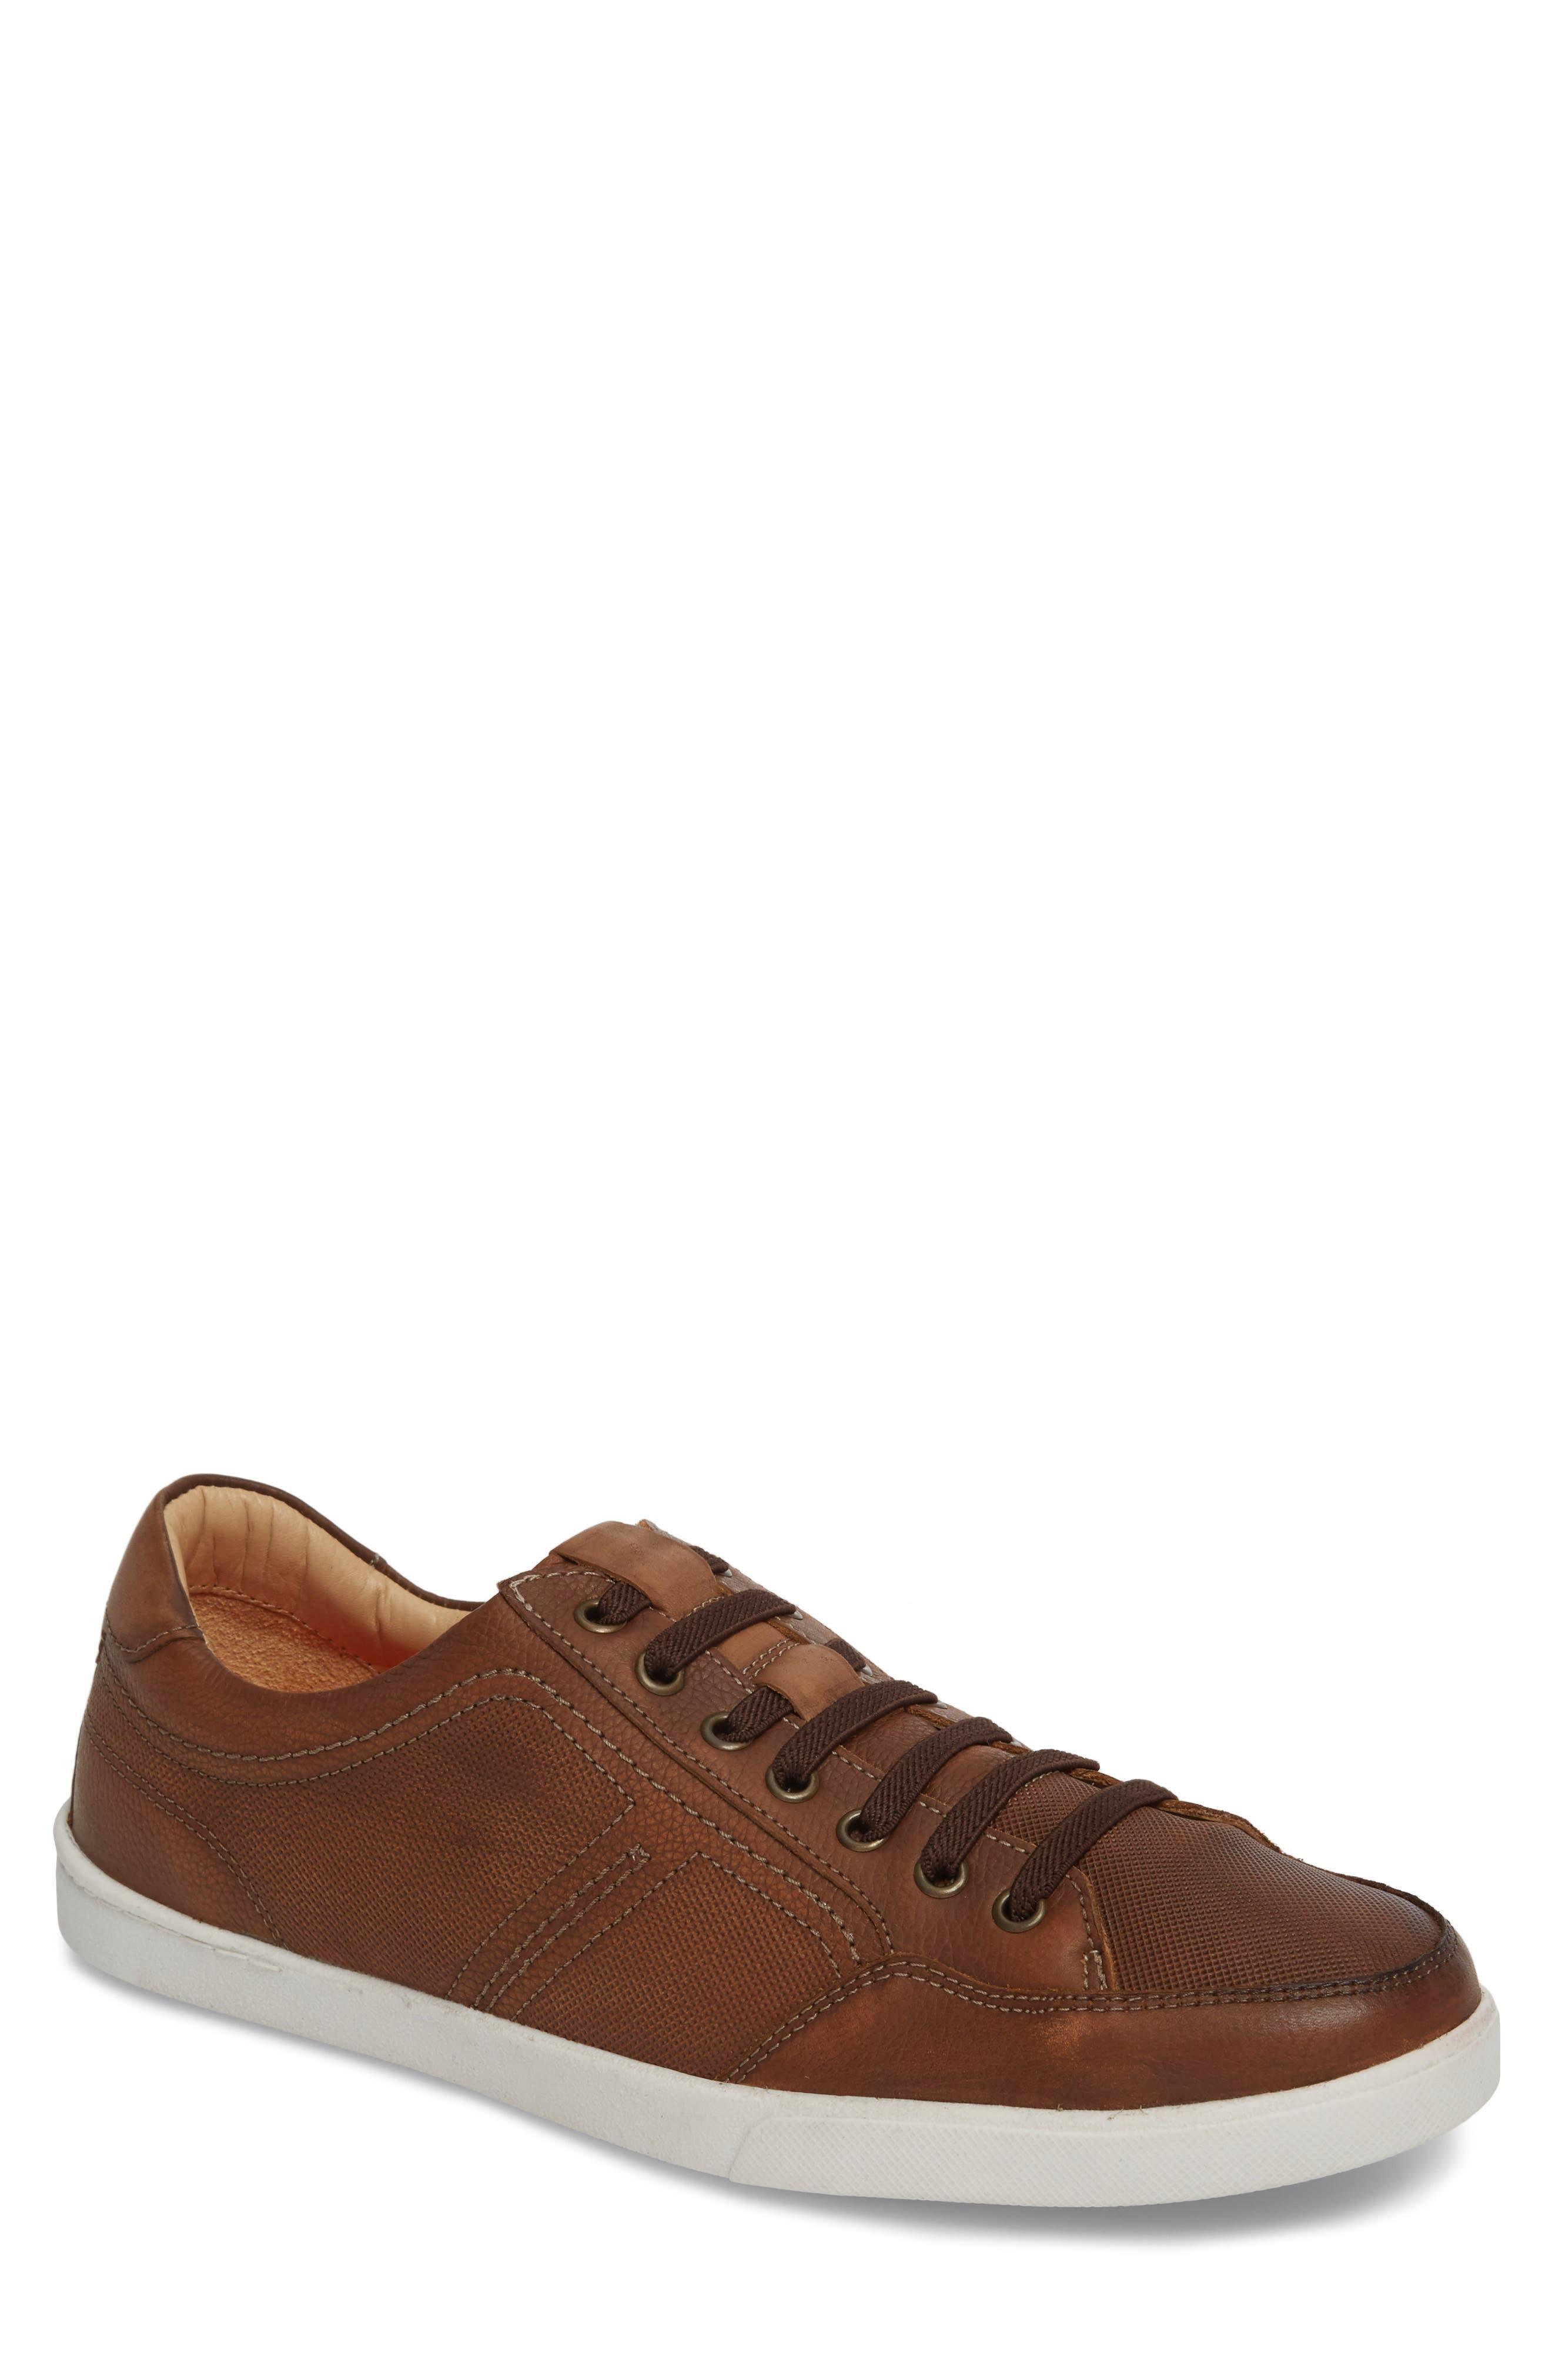 Quinton Textured Low Top Sneaker,                             Main thumbnail 1, color,                             Tan Leather